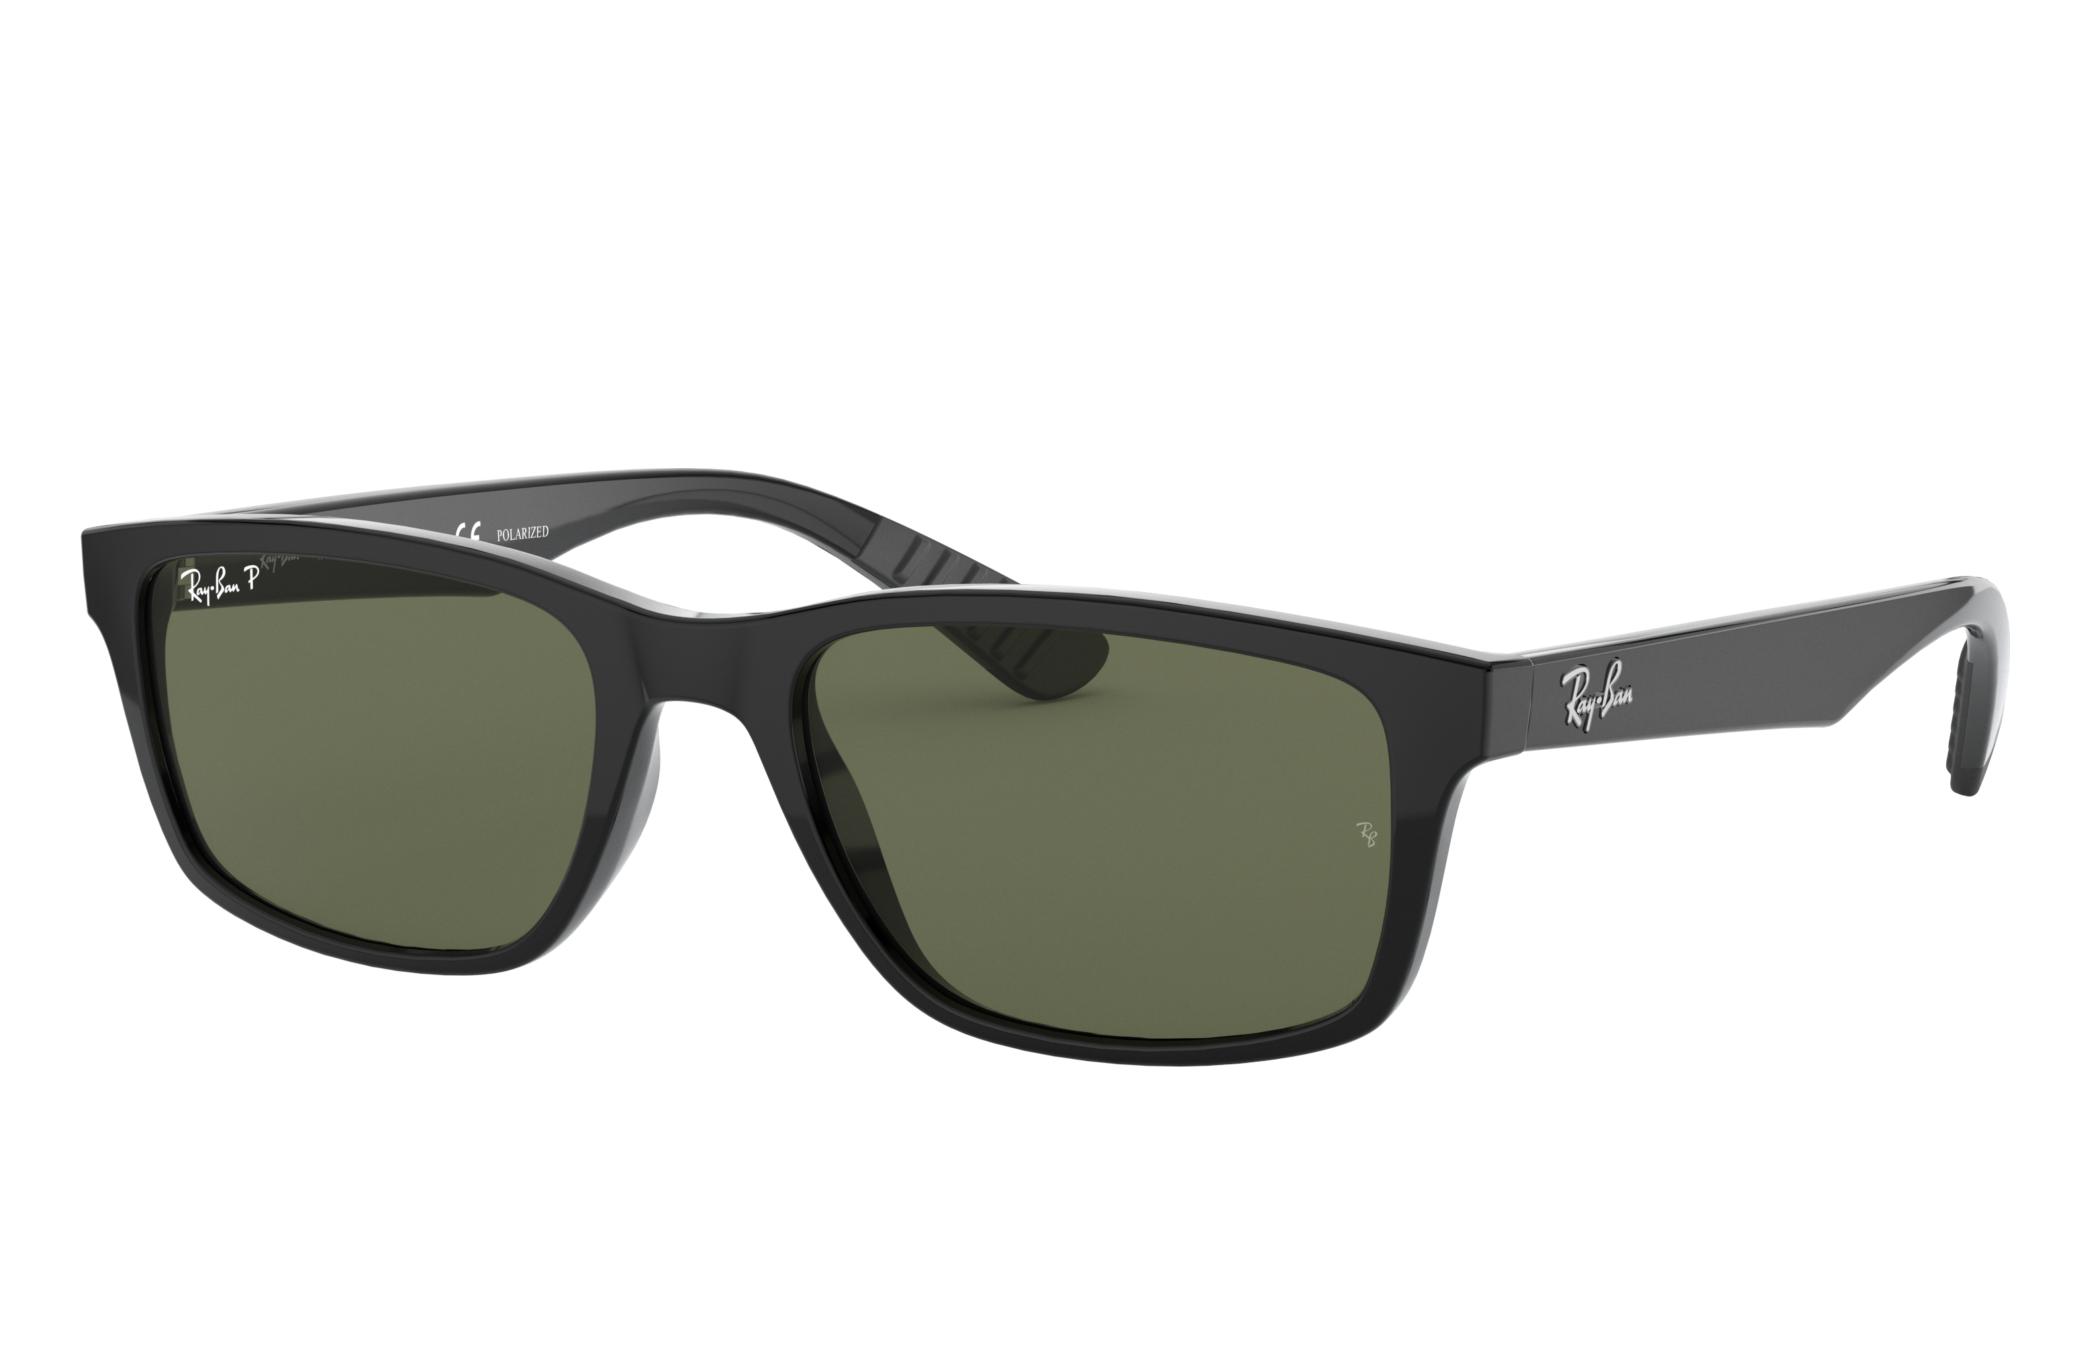 Ray-Ban Rb4234 Black, Polarized Green Lenses - RB4234